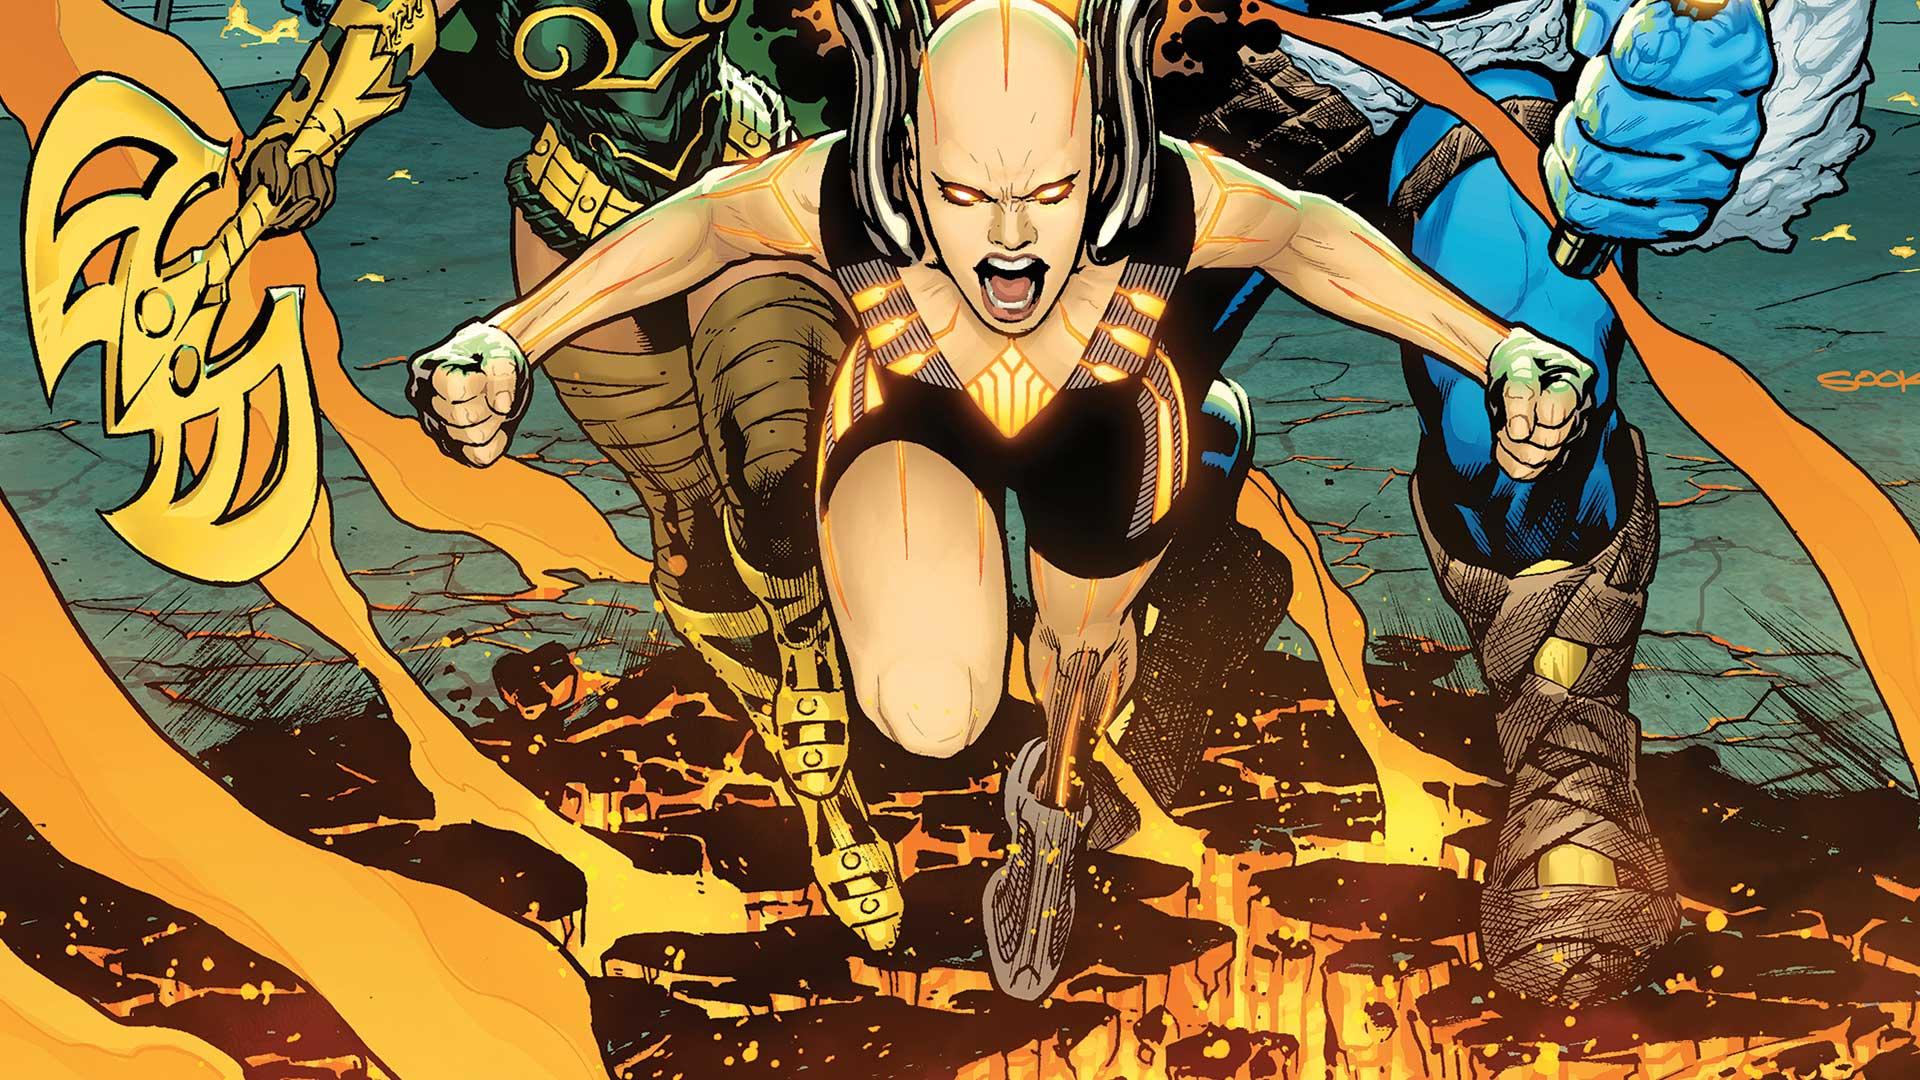 The Unexpected #1 - DC Comics